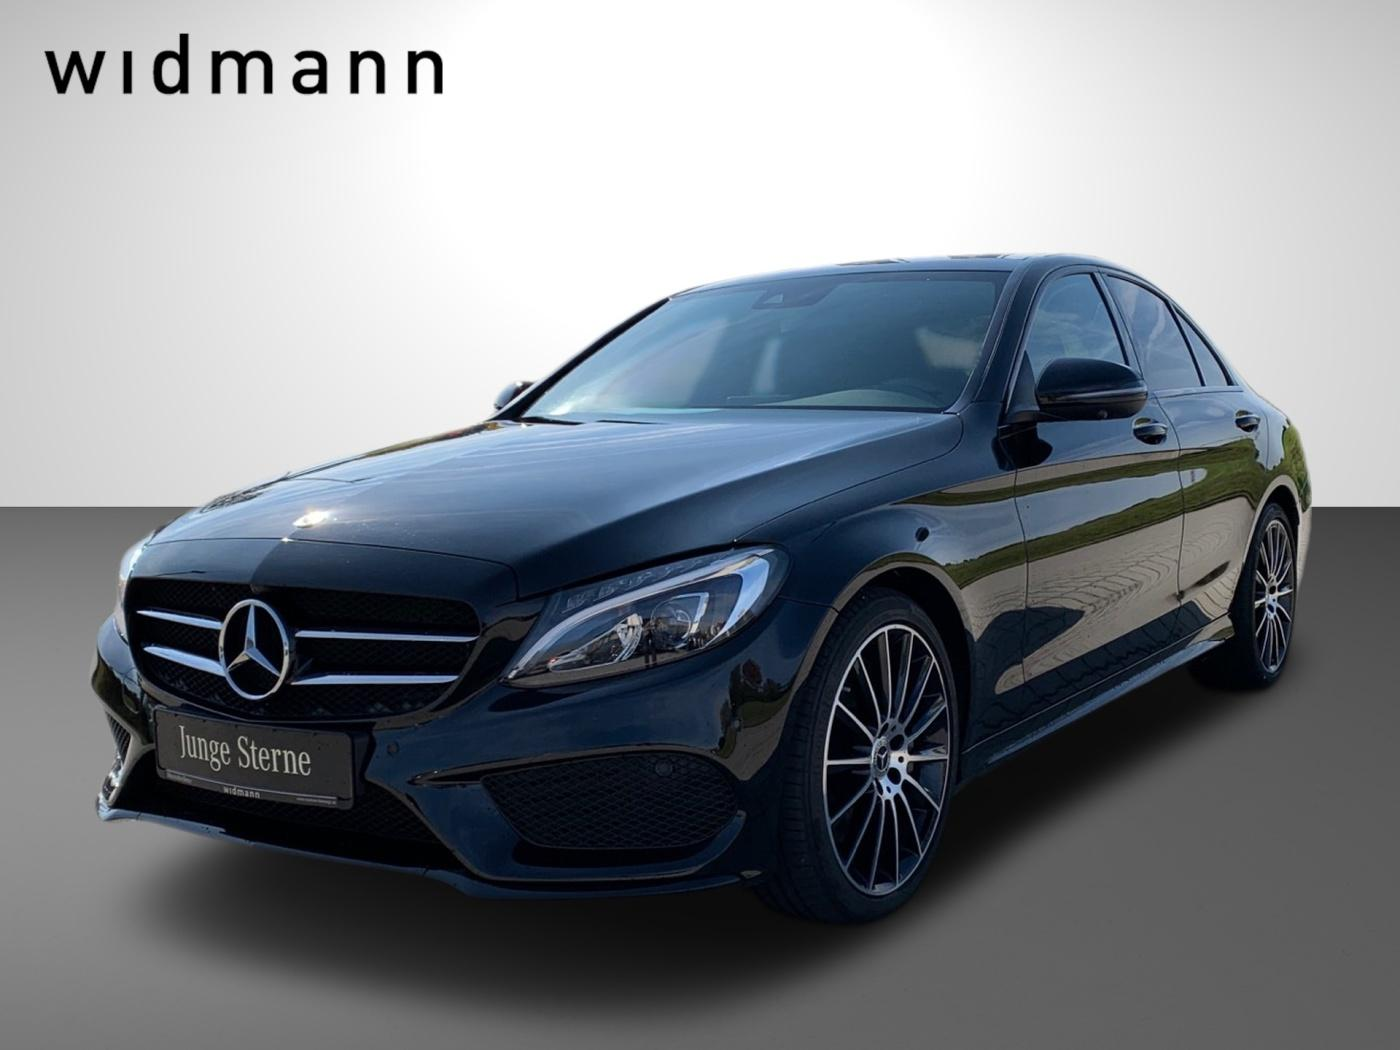 Mercedes-Benz C 400 4M AMG*Burmester*Pano.-Dach*360°*Night*LED, Jahr 2018, Benzin